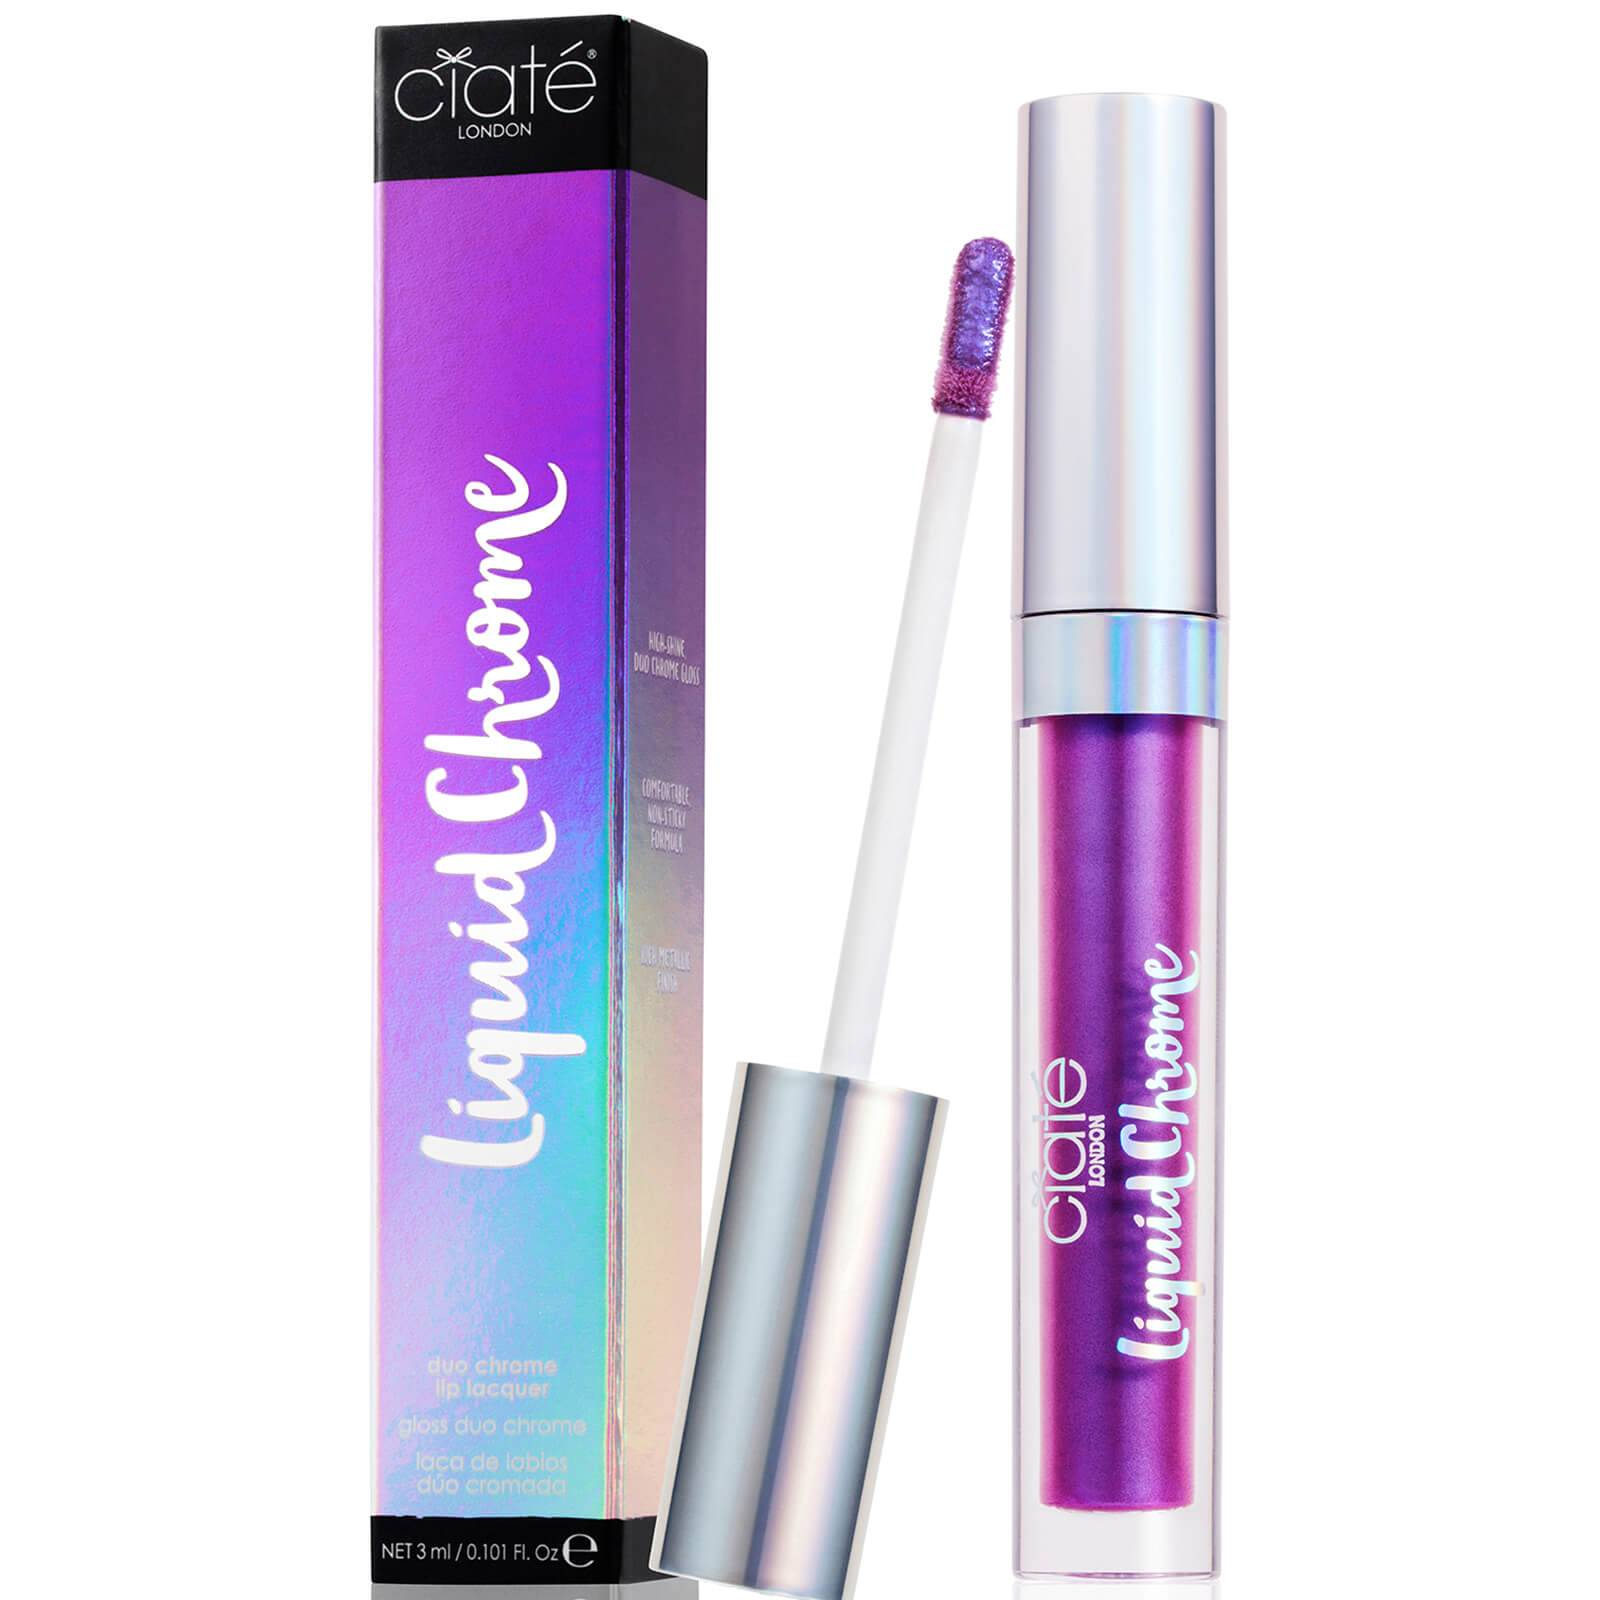 Ciaté London Liquid Chrome Lipstick - Zodiac